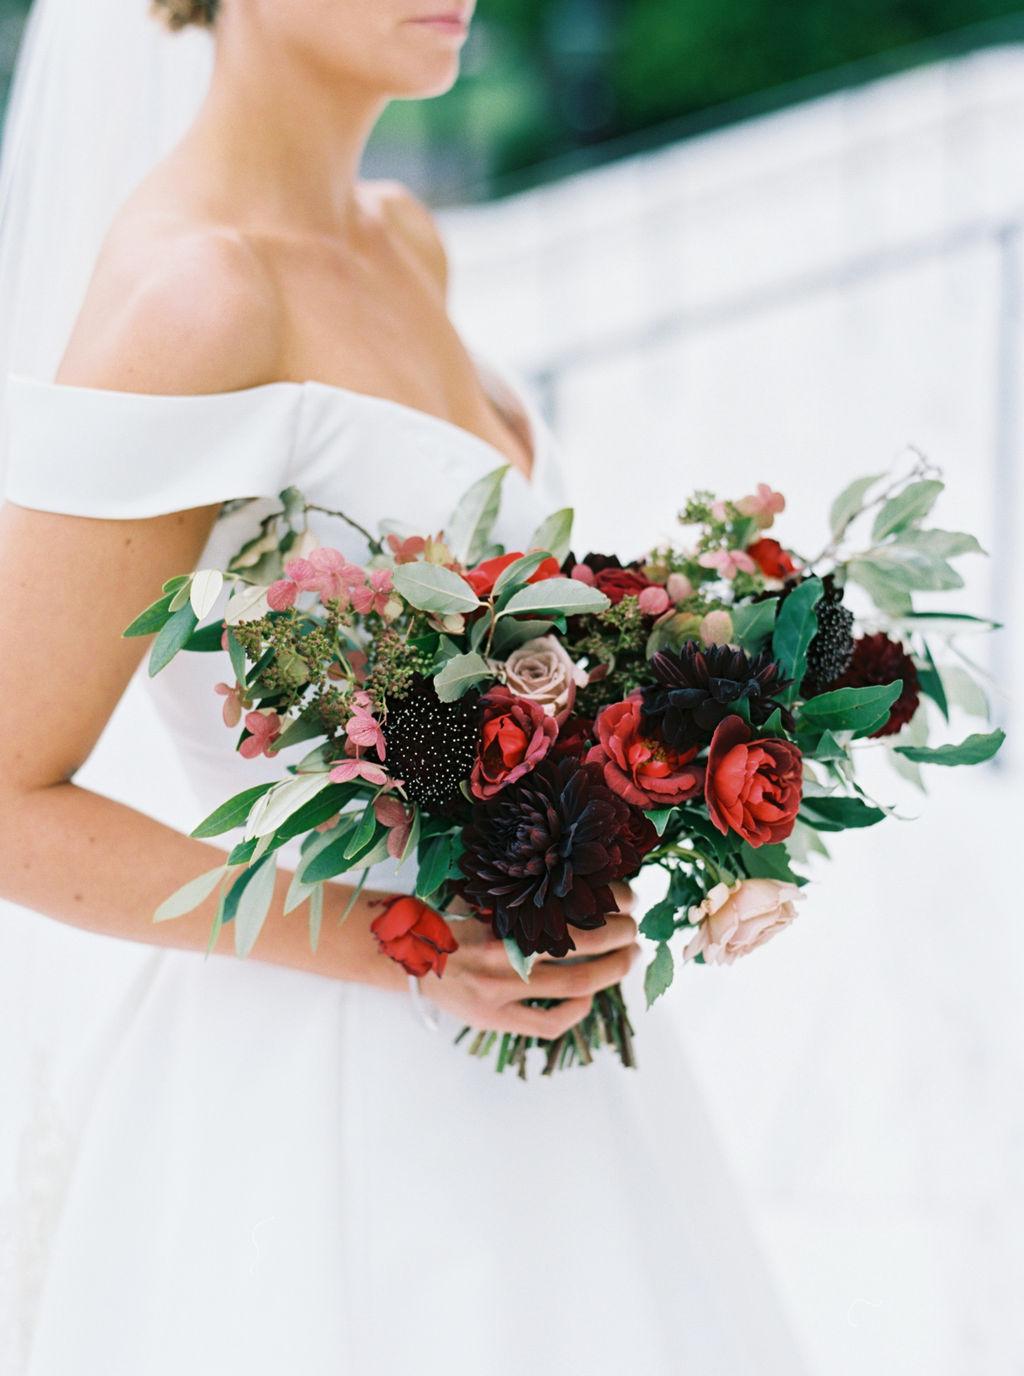 Kyle-Menna-Wedding-krmorenophoto-377.jpg